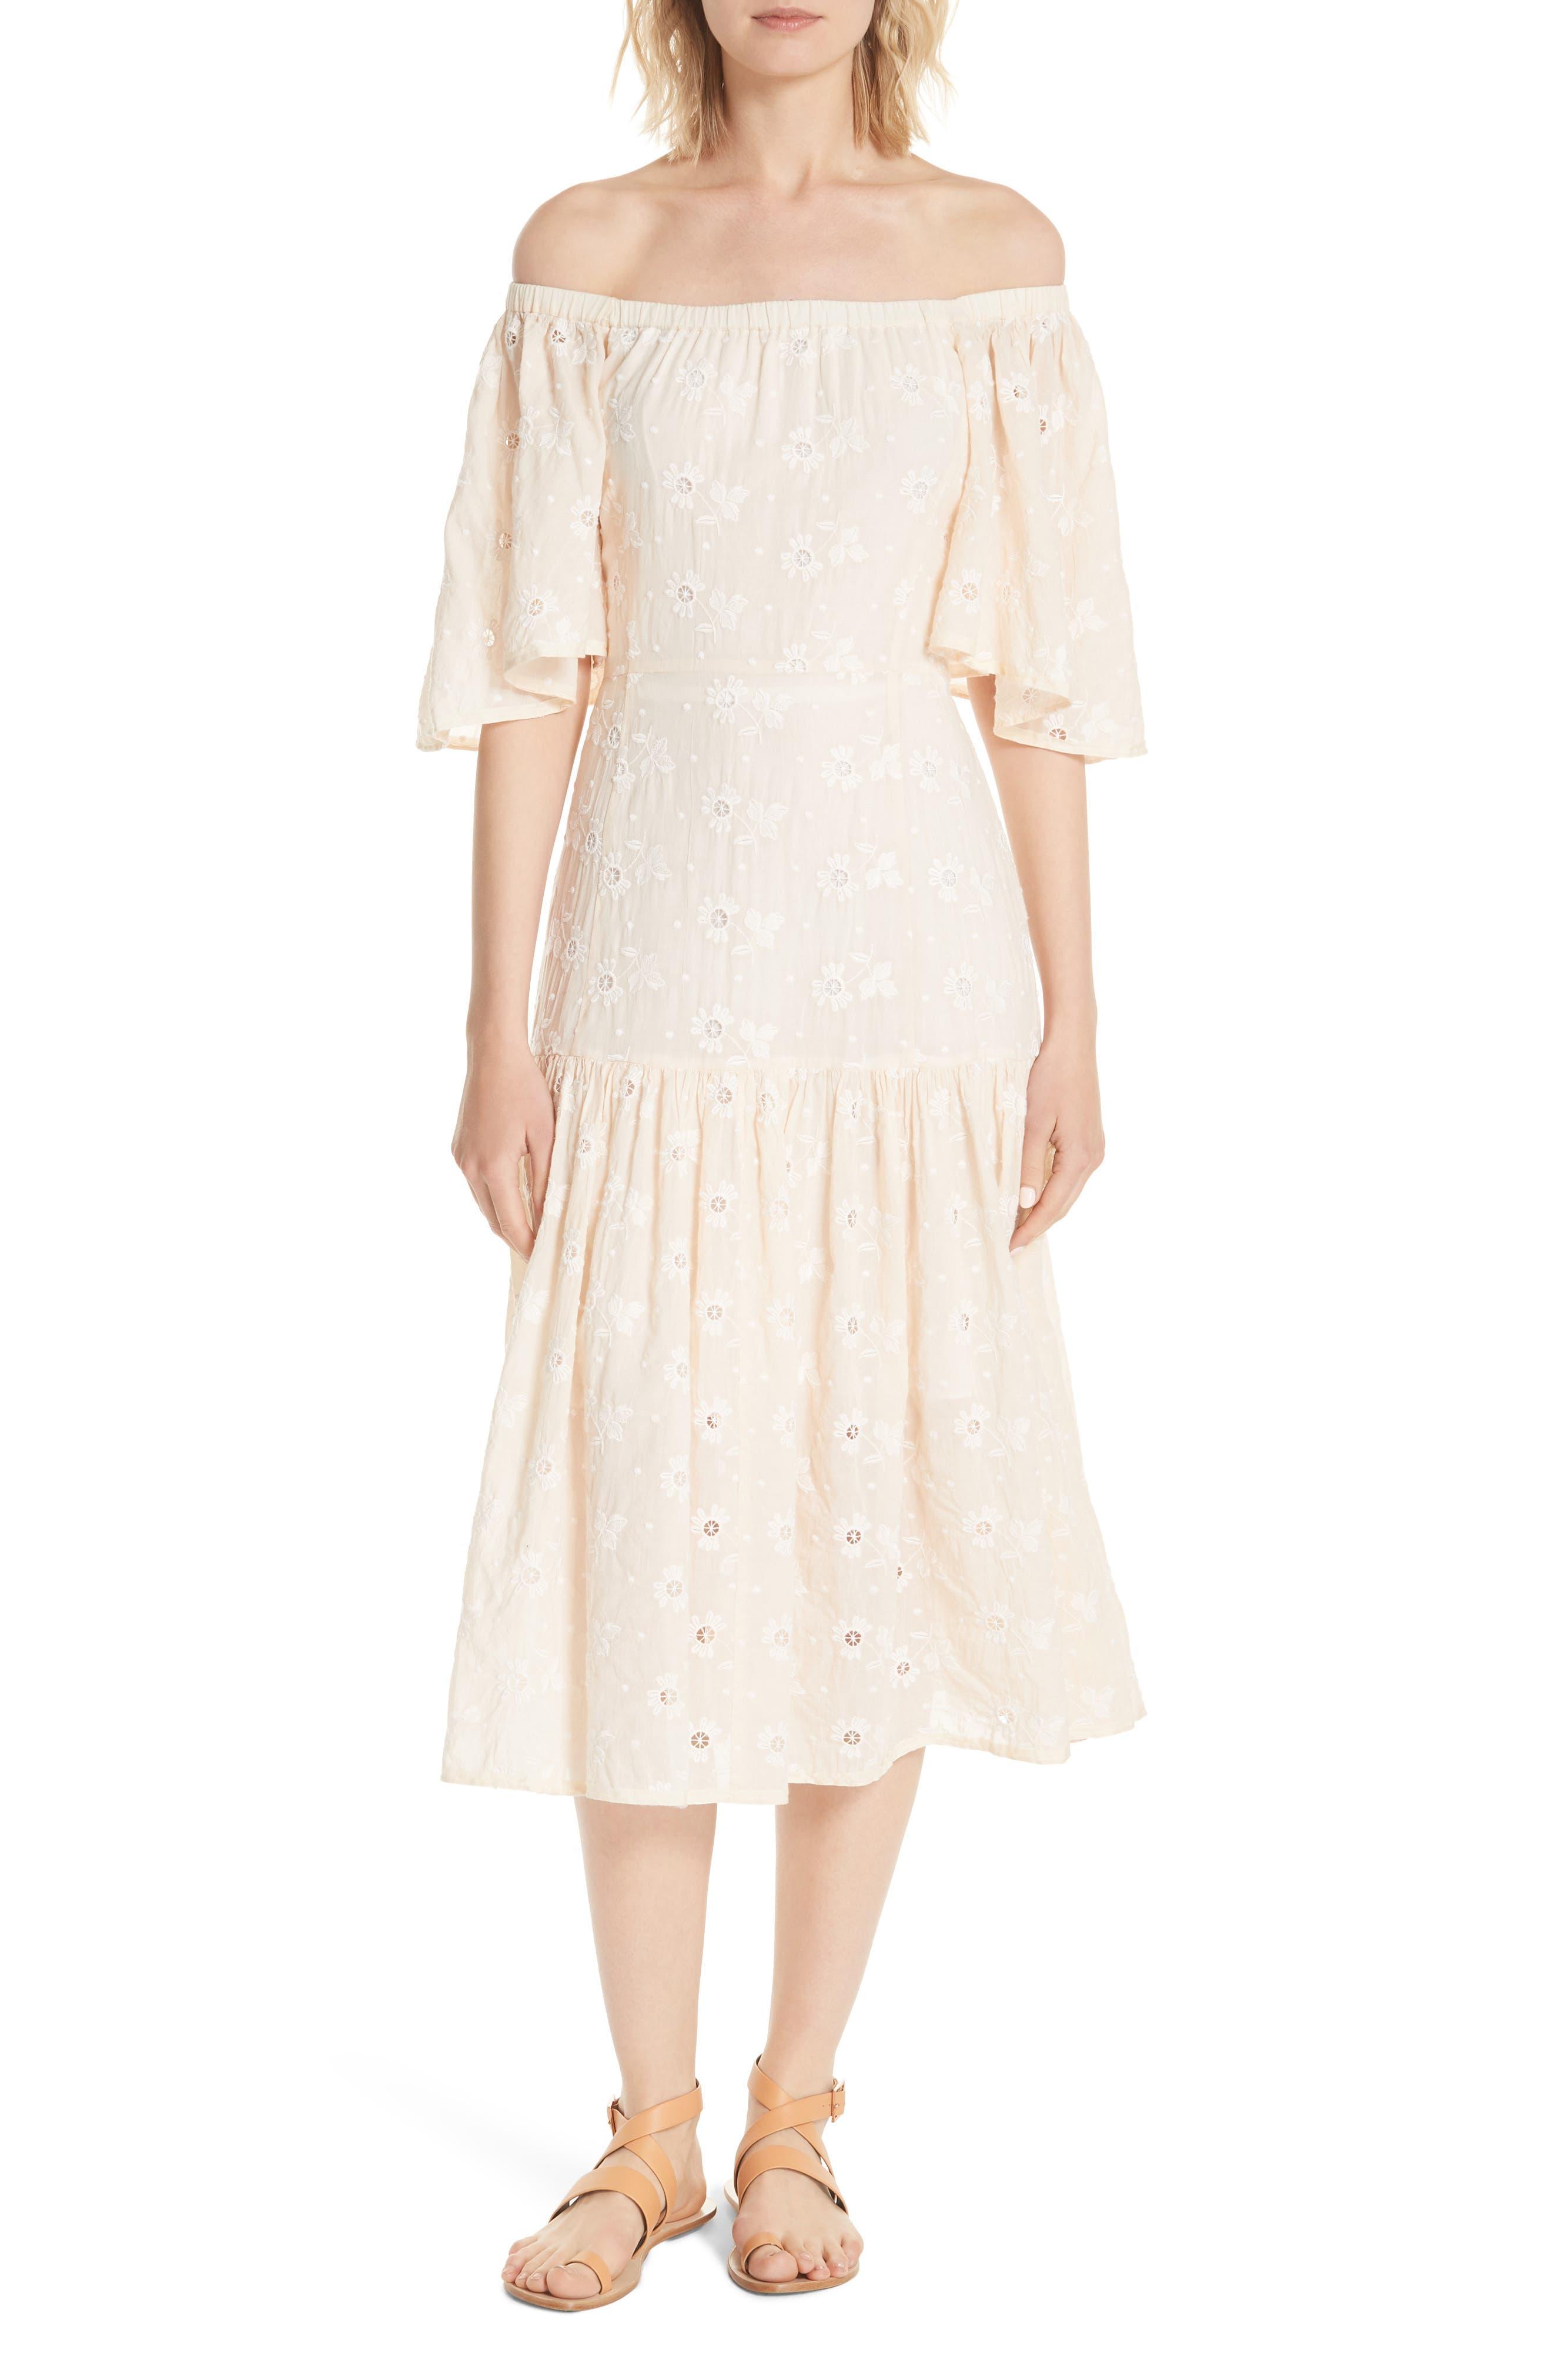 La Vie Rebecca Taylor Helene Embroidery Off the Shoulder Cotton Dress